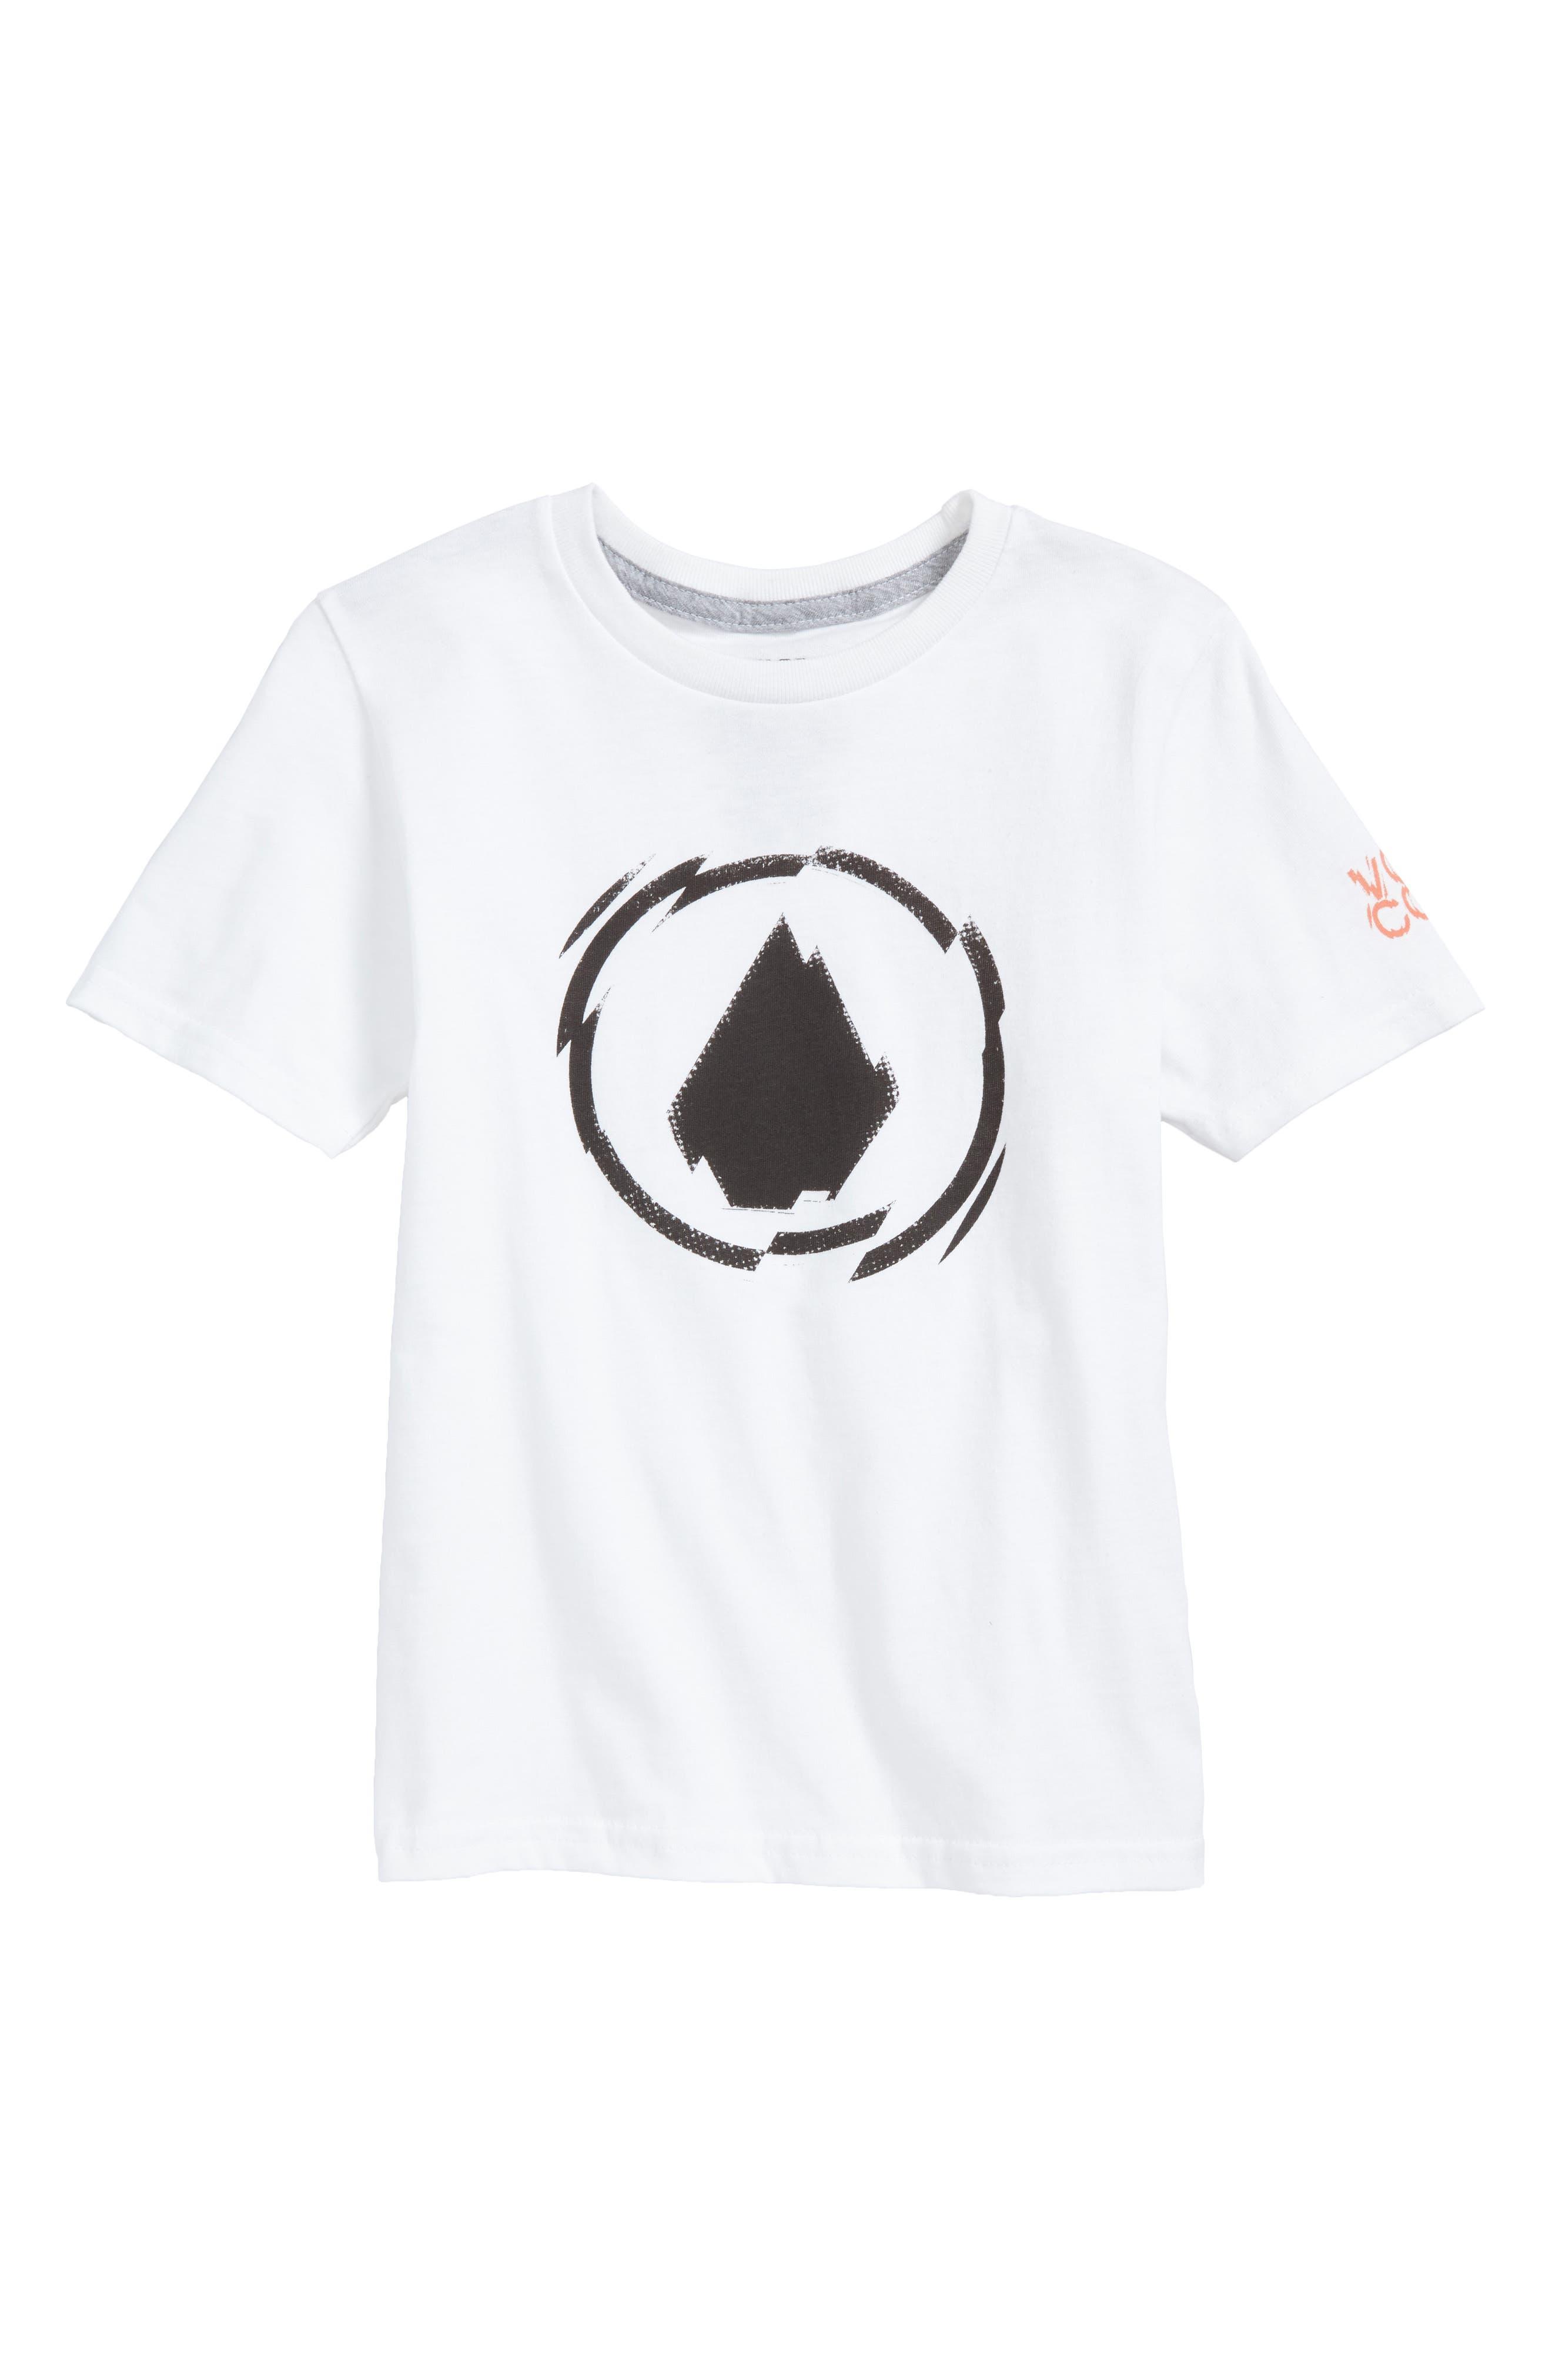 Shatter T-Shirt,                             Main thumbnail 1, color,